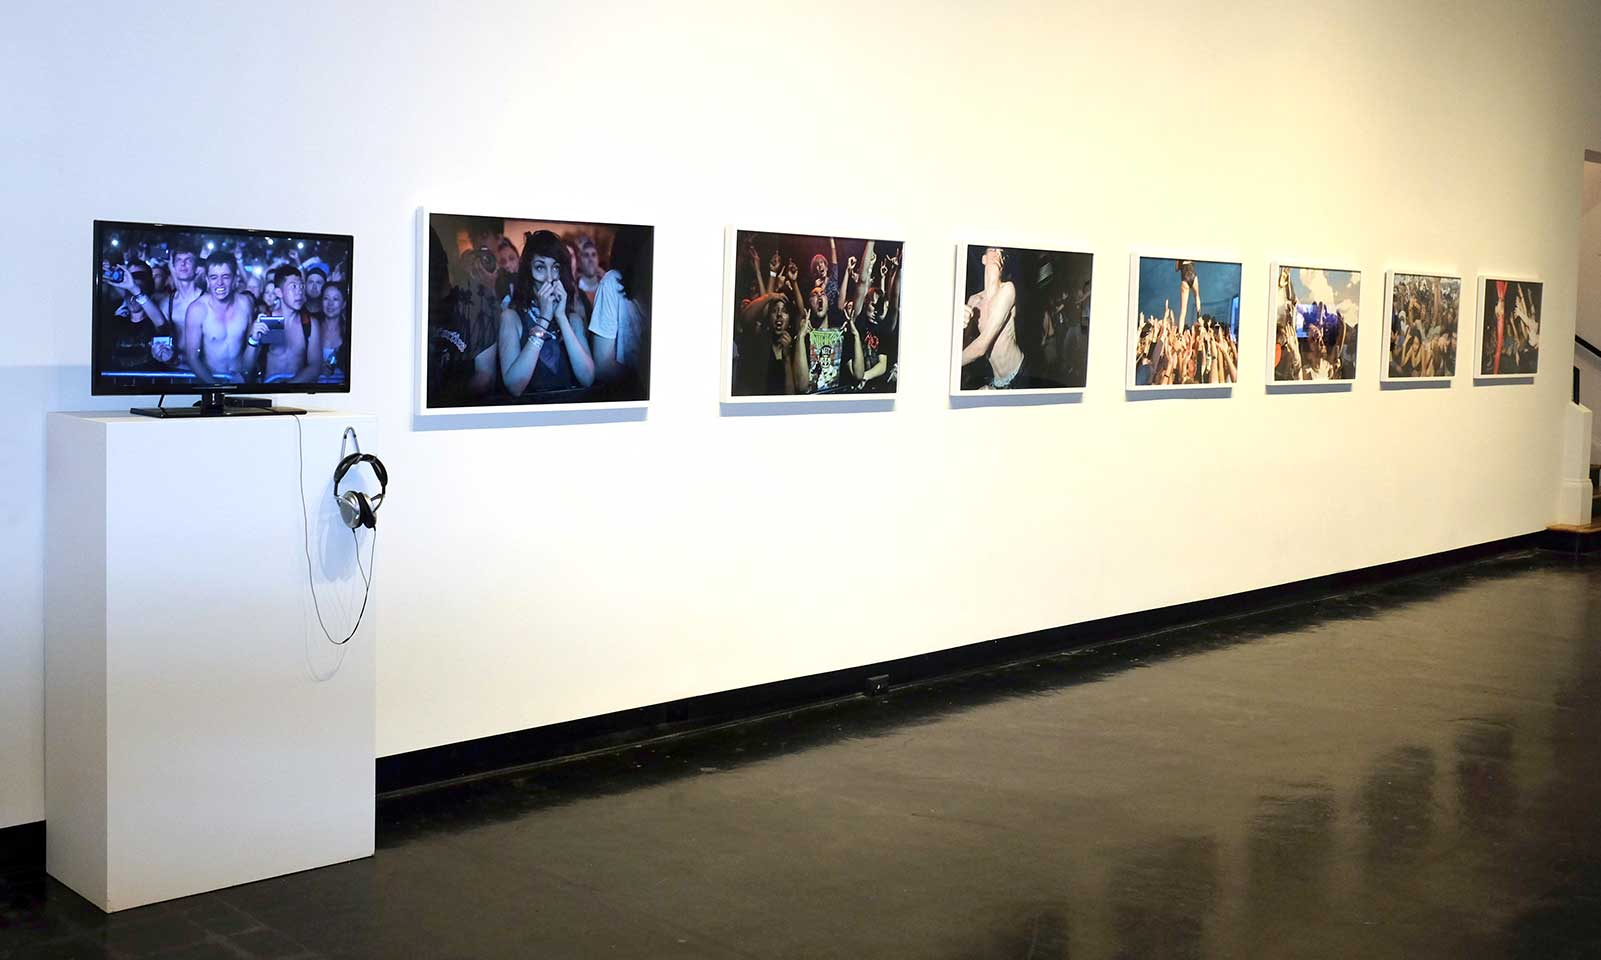 Lawndale Arts Center